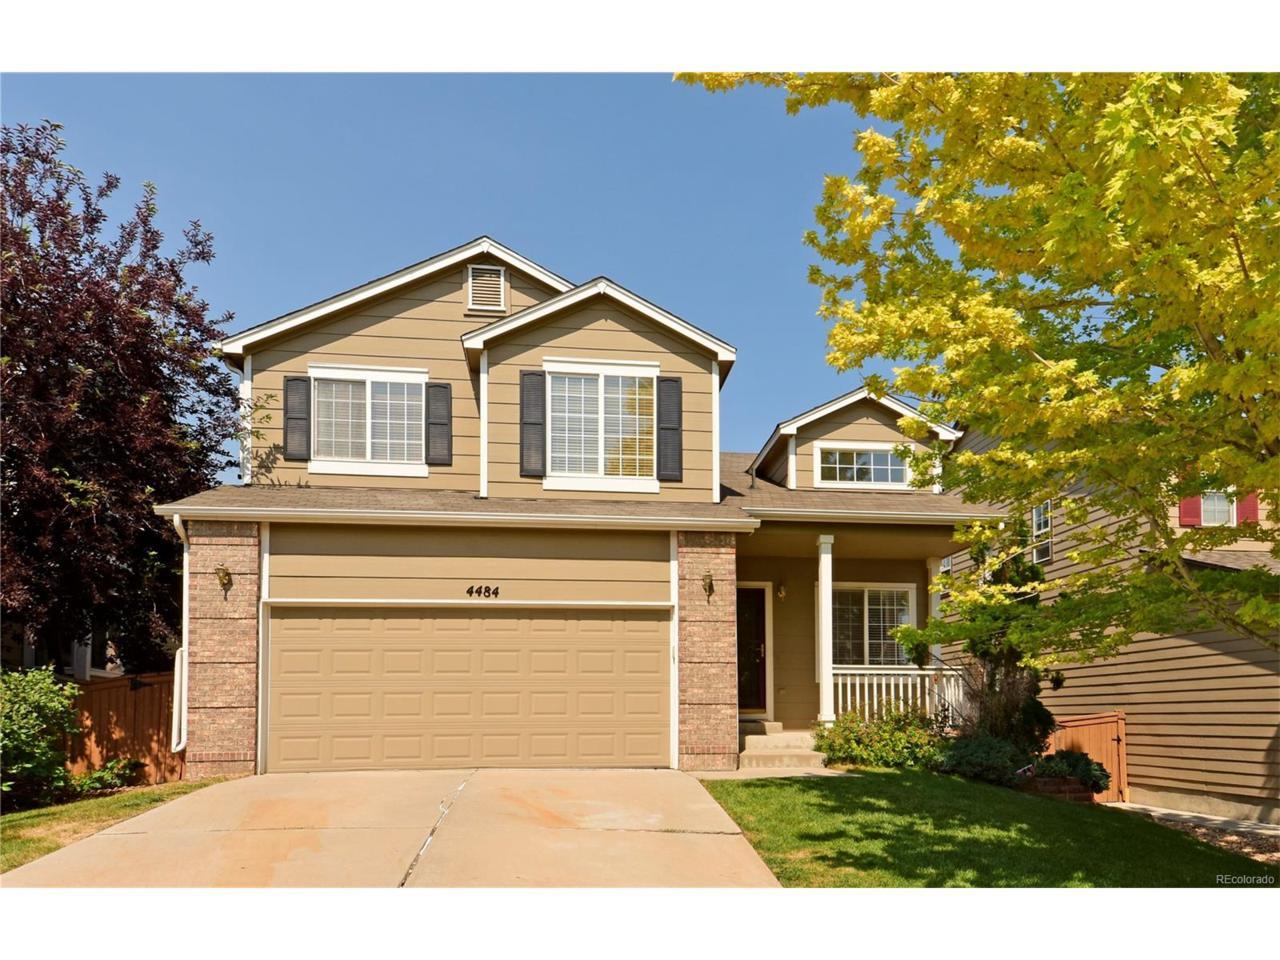 4484 Ketchwood Circle, Highlands Ranch, CO 80130 (MLS #6117994) :: 8z Real Estate